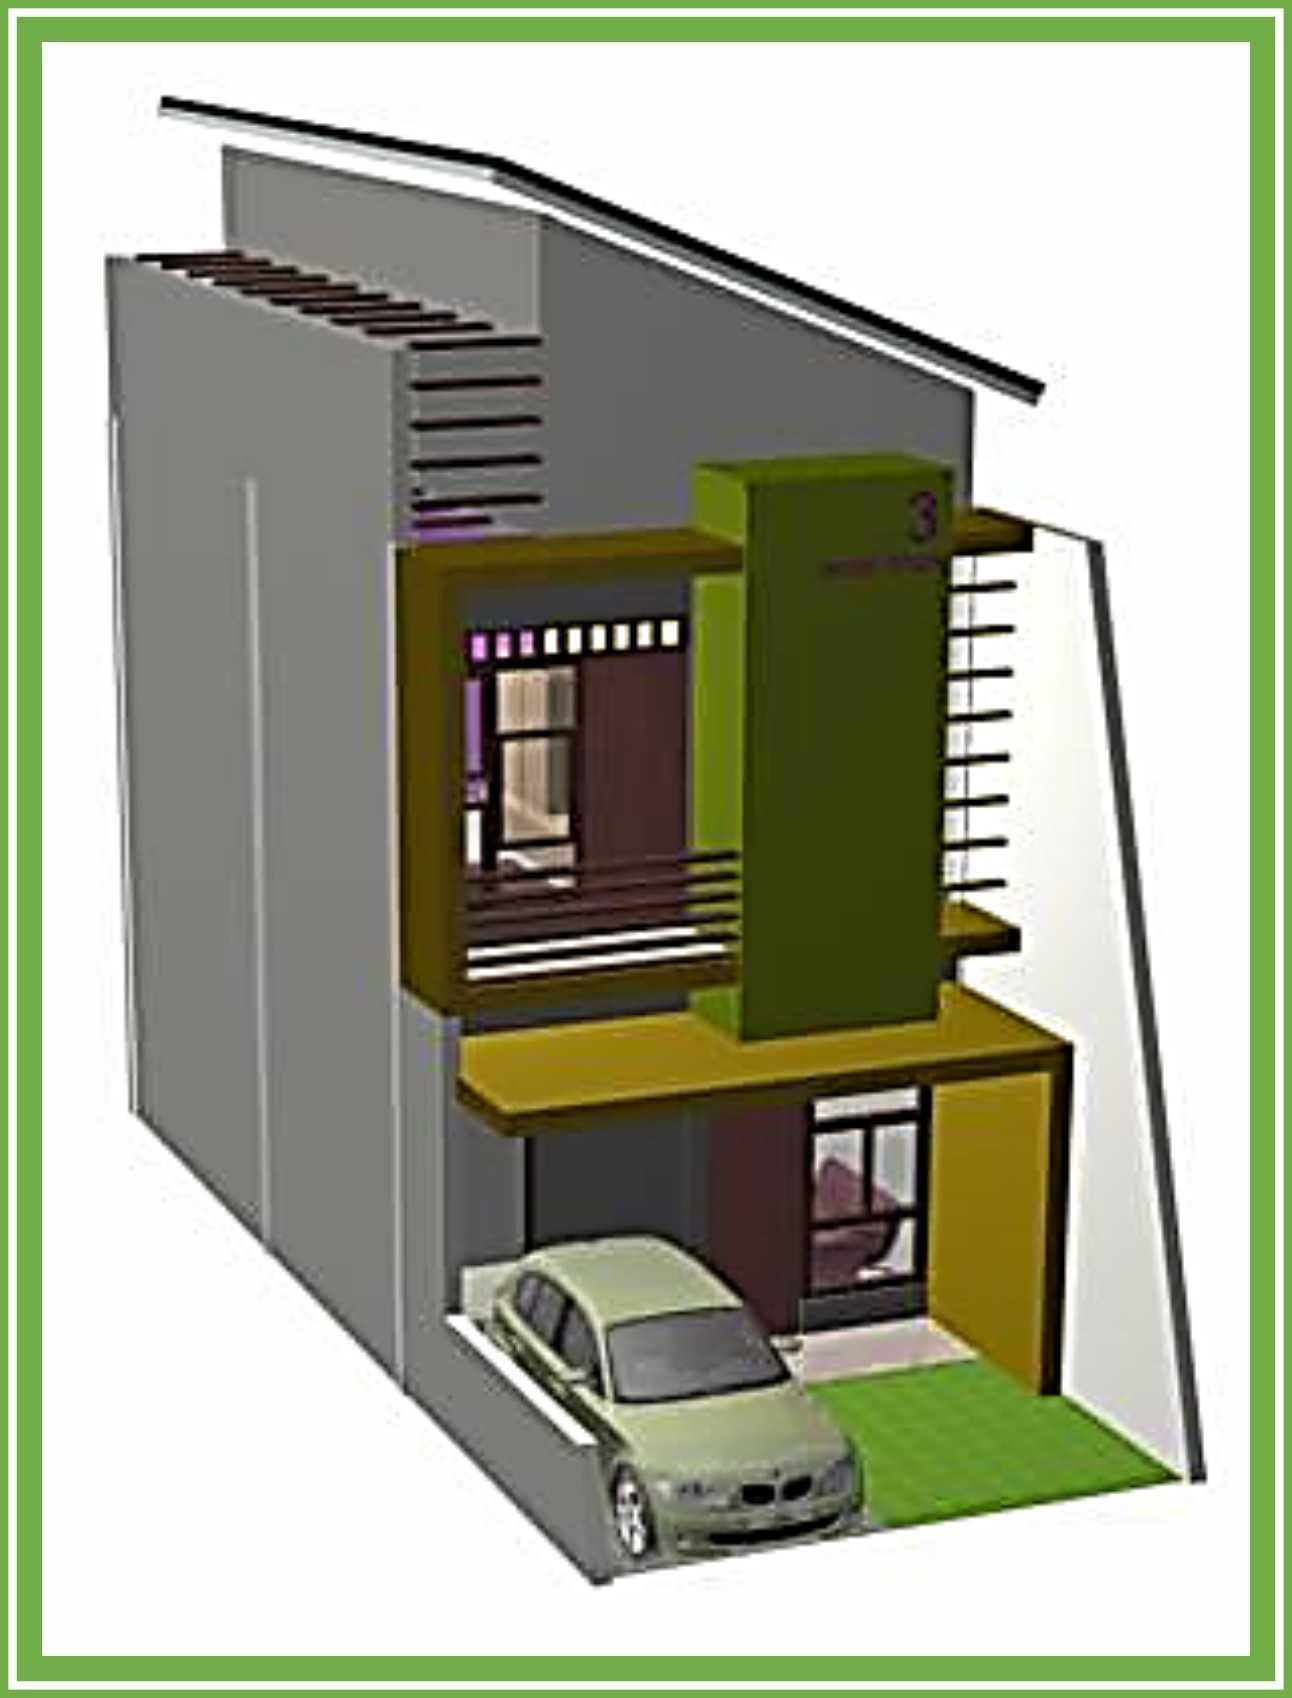 Ideall Design Renovasi Rumah 5X12 Cluster Alamanda Regency Blok L, Bekasi Utara Jl. Pd. Ungu Permai, Bahagia, Kec. Babelan, Kota Bks, Jawa Barat 17125, Indonesia Jl. Pd. Ungu Permai, Bahagia, Kec. Babelan, Kota Bks, Jawa Barat 17125, Indonesia Ideall-Design-When-A-Design-Idea-Becomes-Ideal-Design-For-All-Renovasi-Rumah-5X12  114419